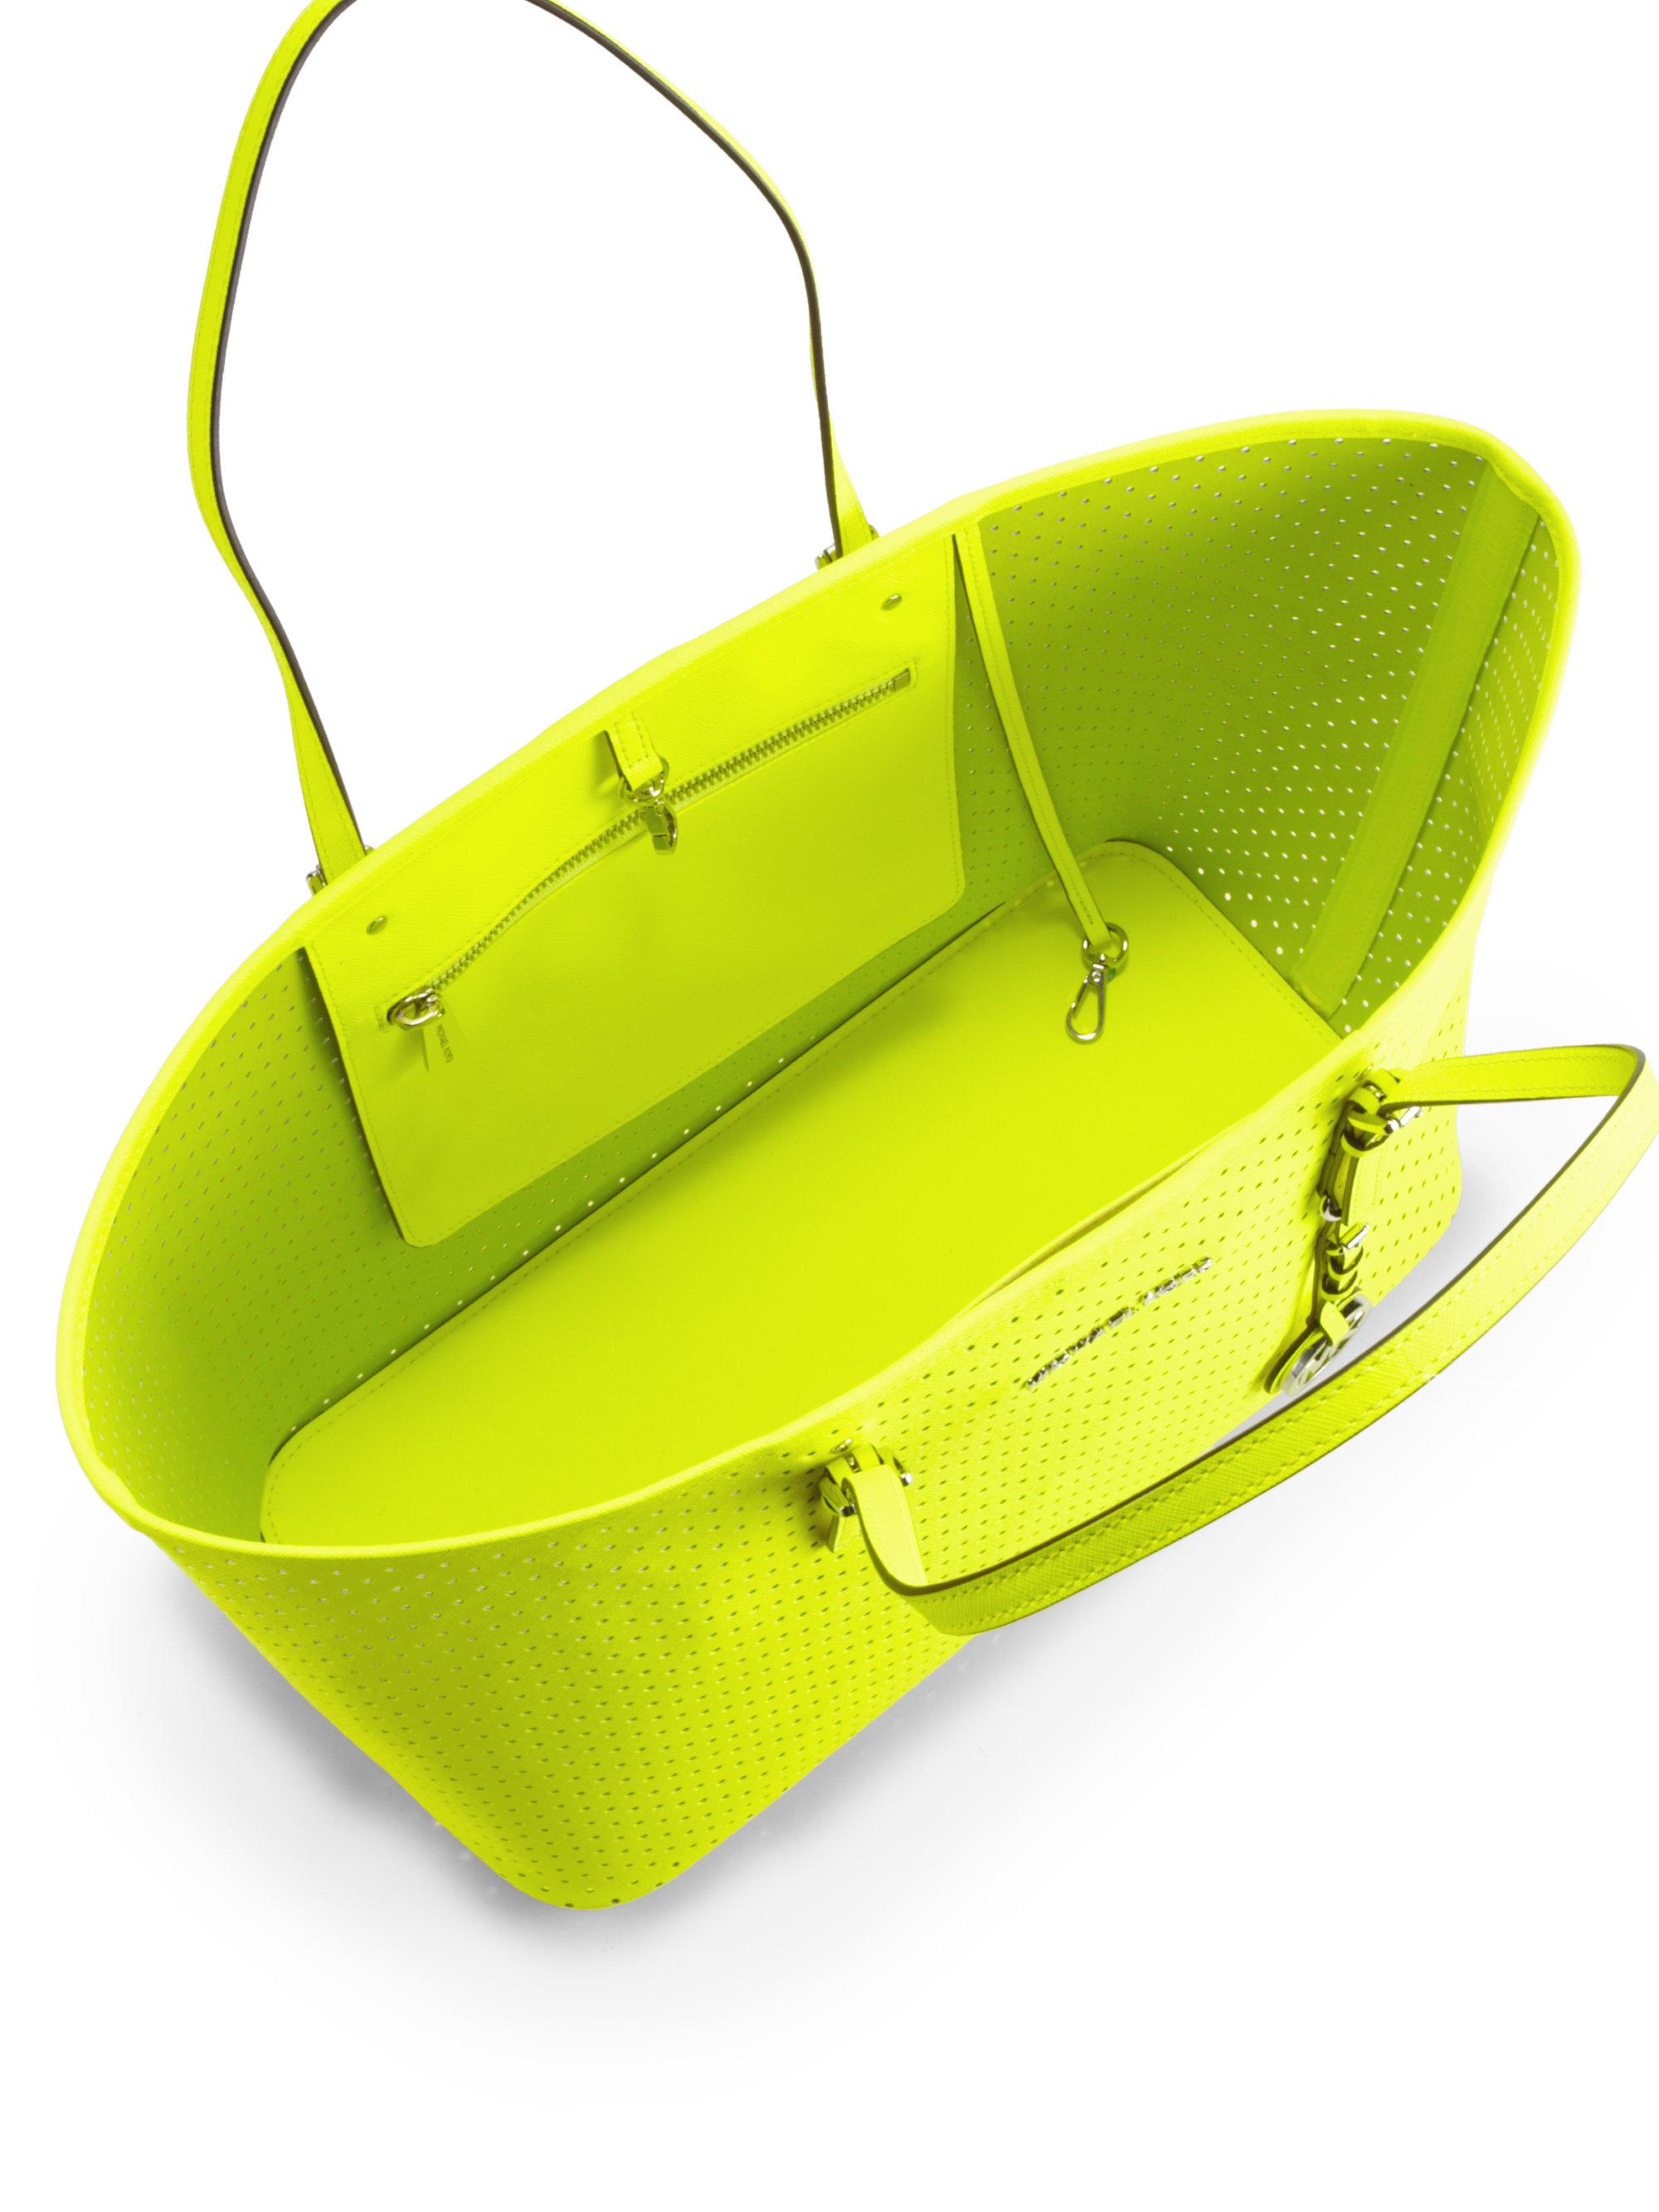 Lime Green Tote Handbag Best 2018